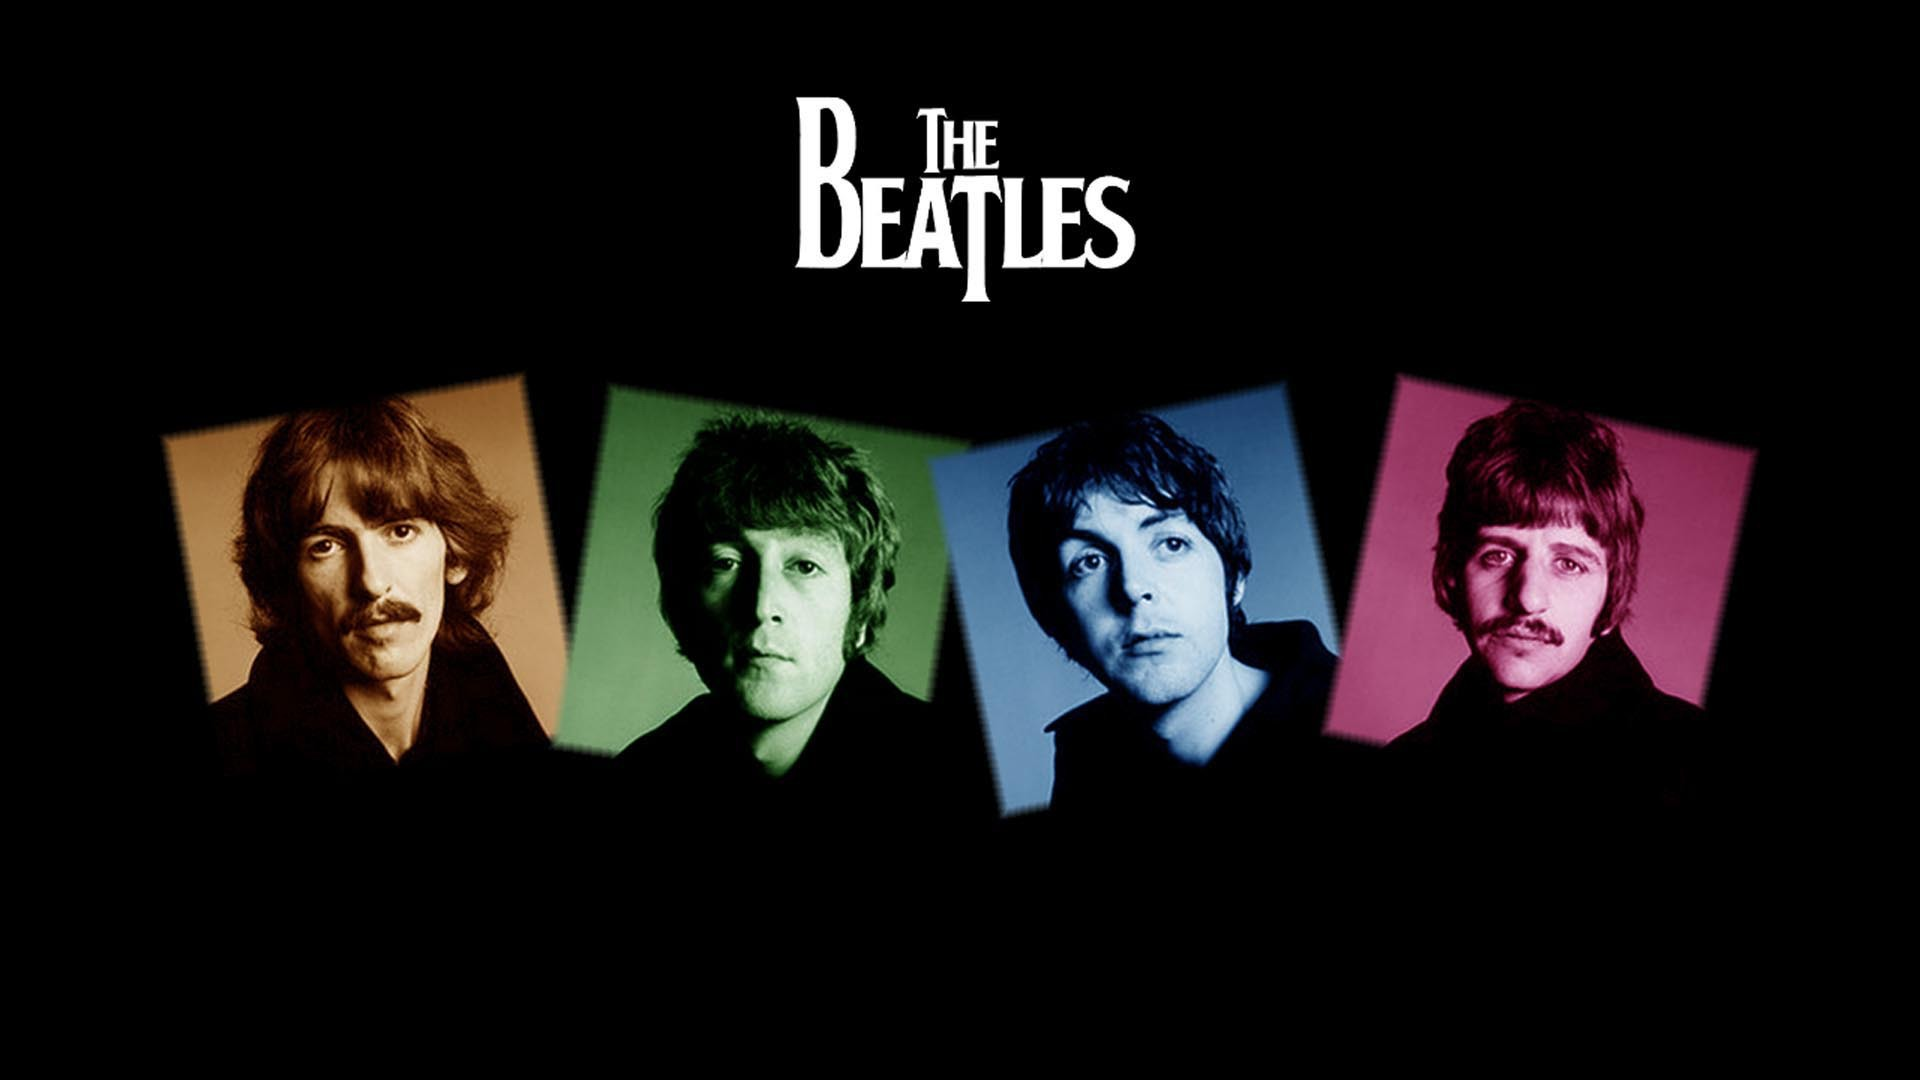 The Beatles Hd Wallpaper